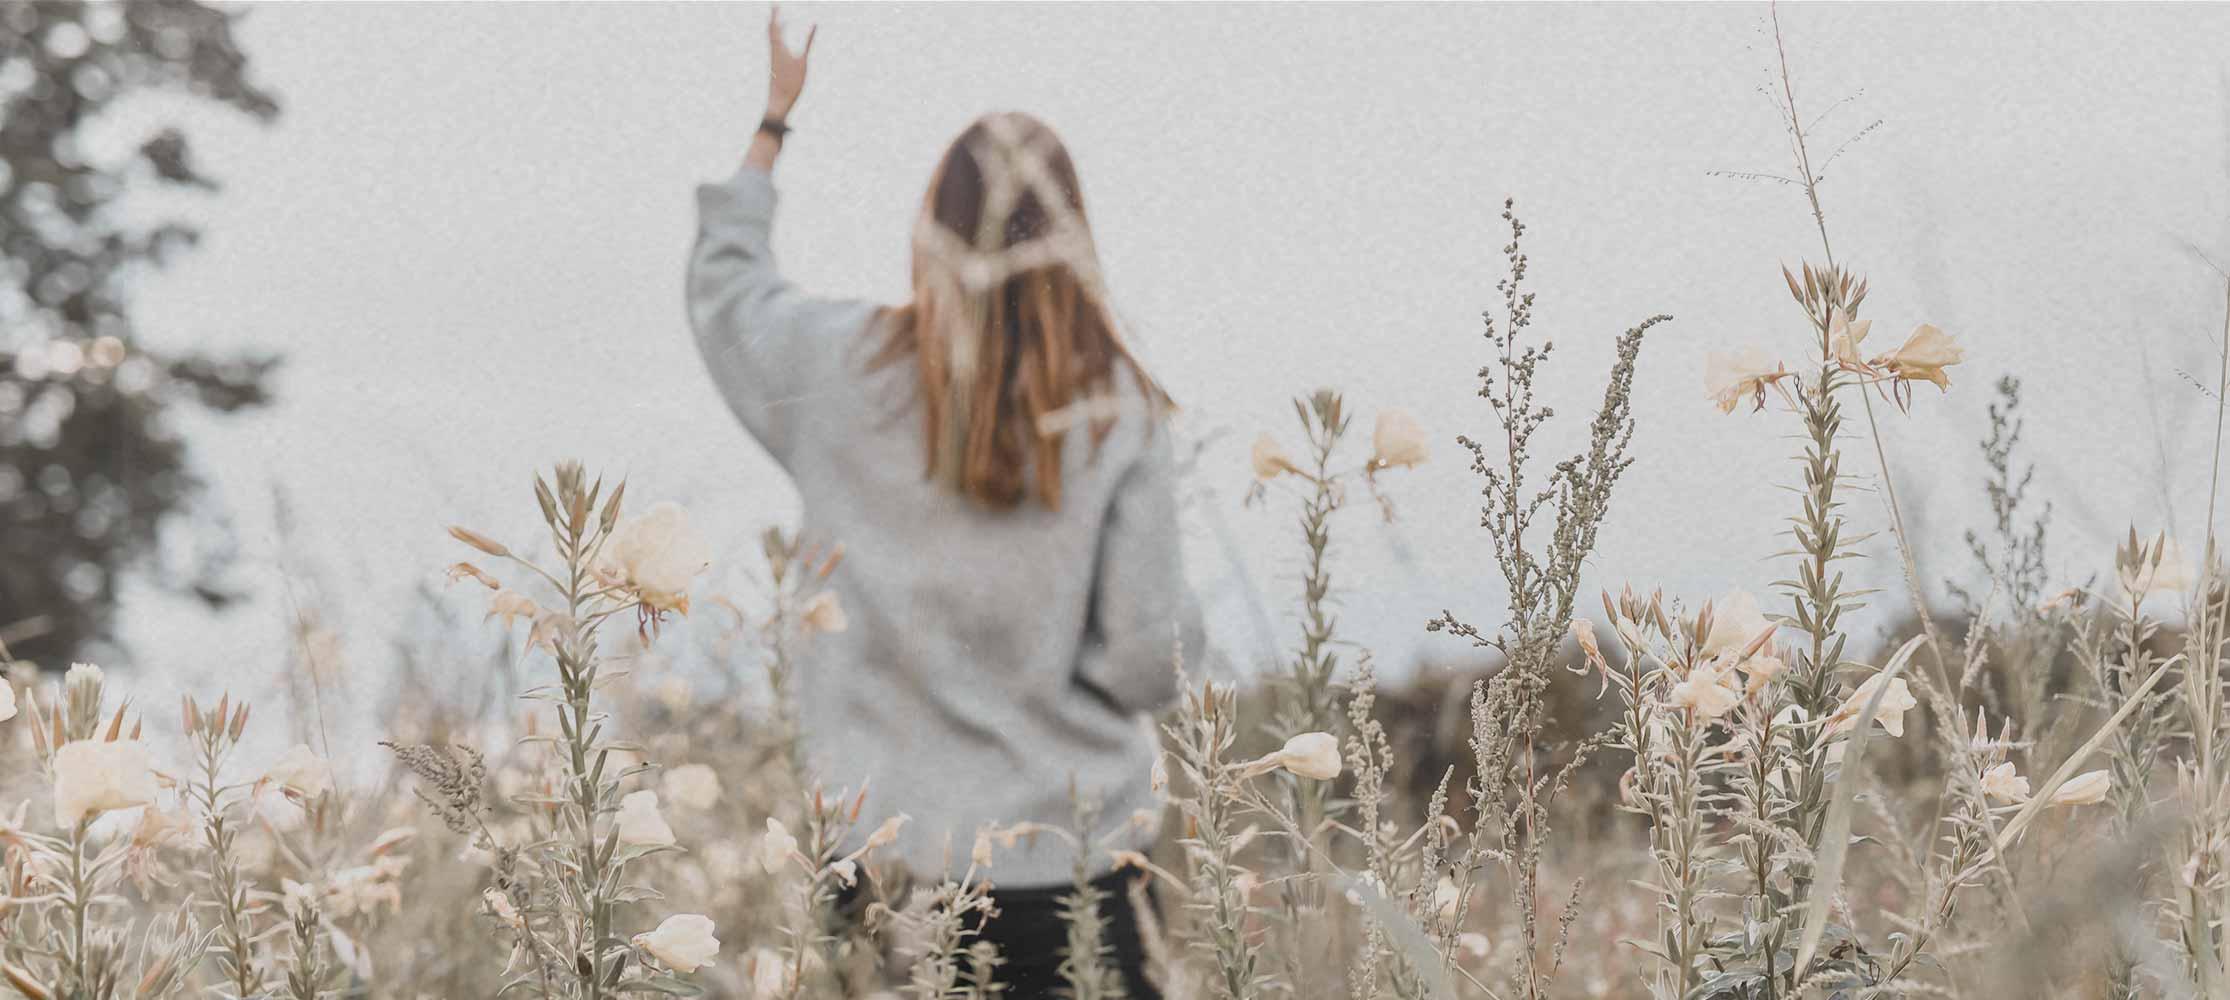 Frau steht im Feld 7-Tage-Gebet